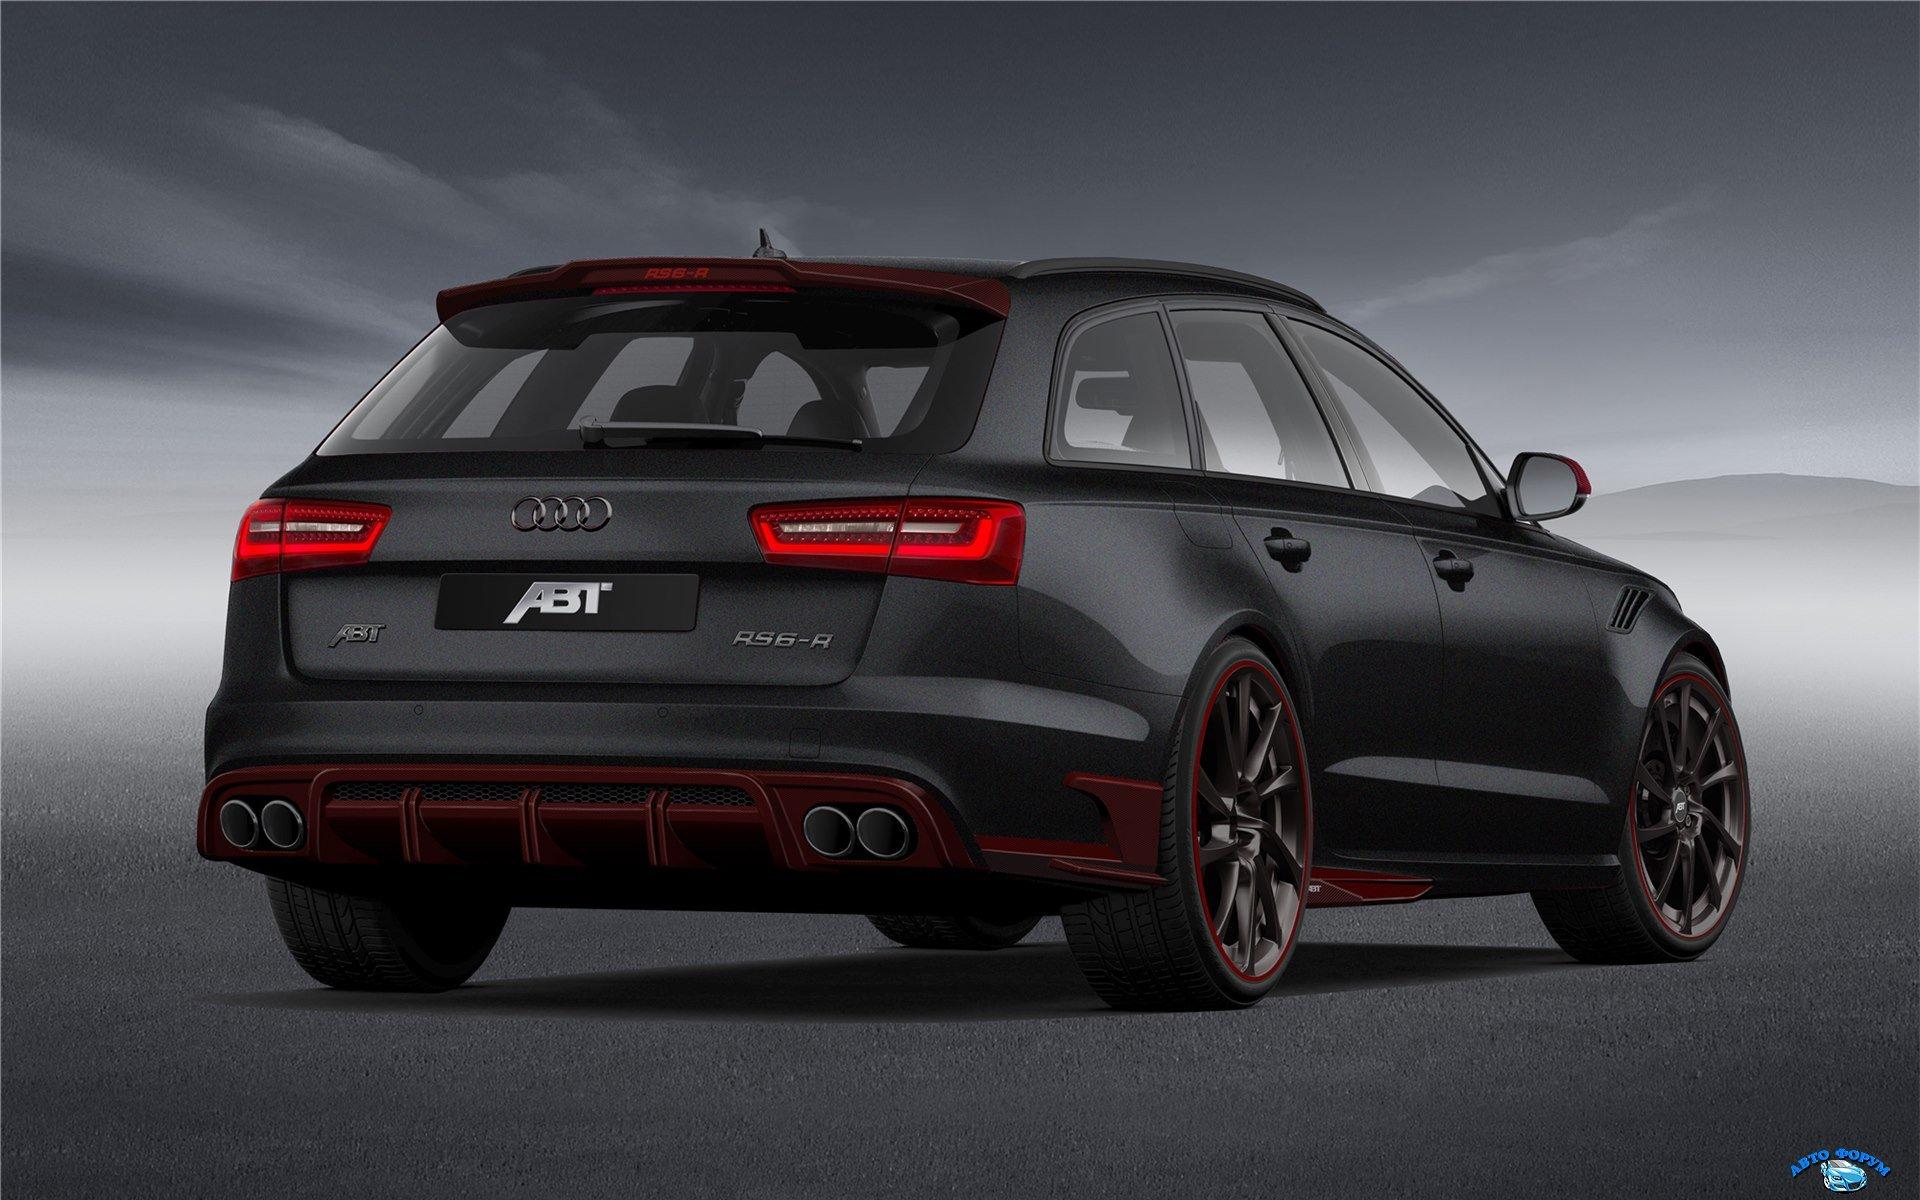 ABT-Sportsline-Audi-RS6-R-2014-widescreen-14.jpg